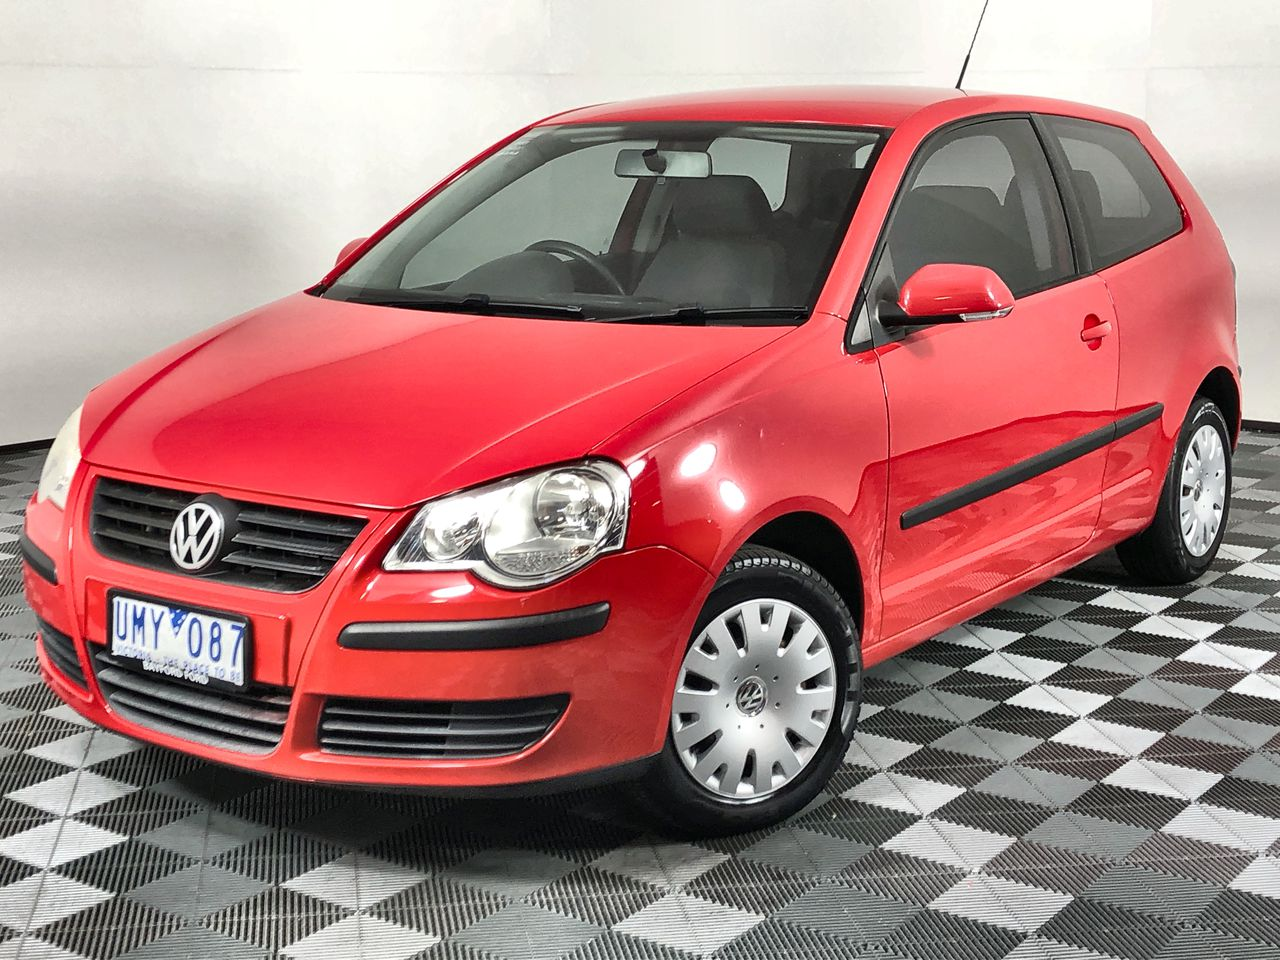 2007 Volkswagen Polo Club 9N Manual Hatchback